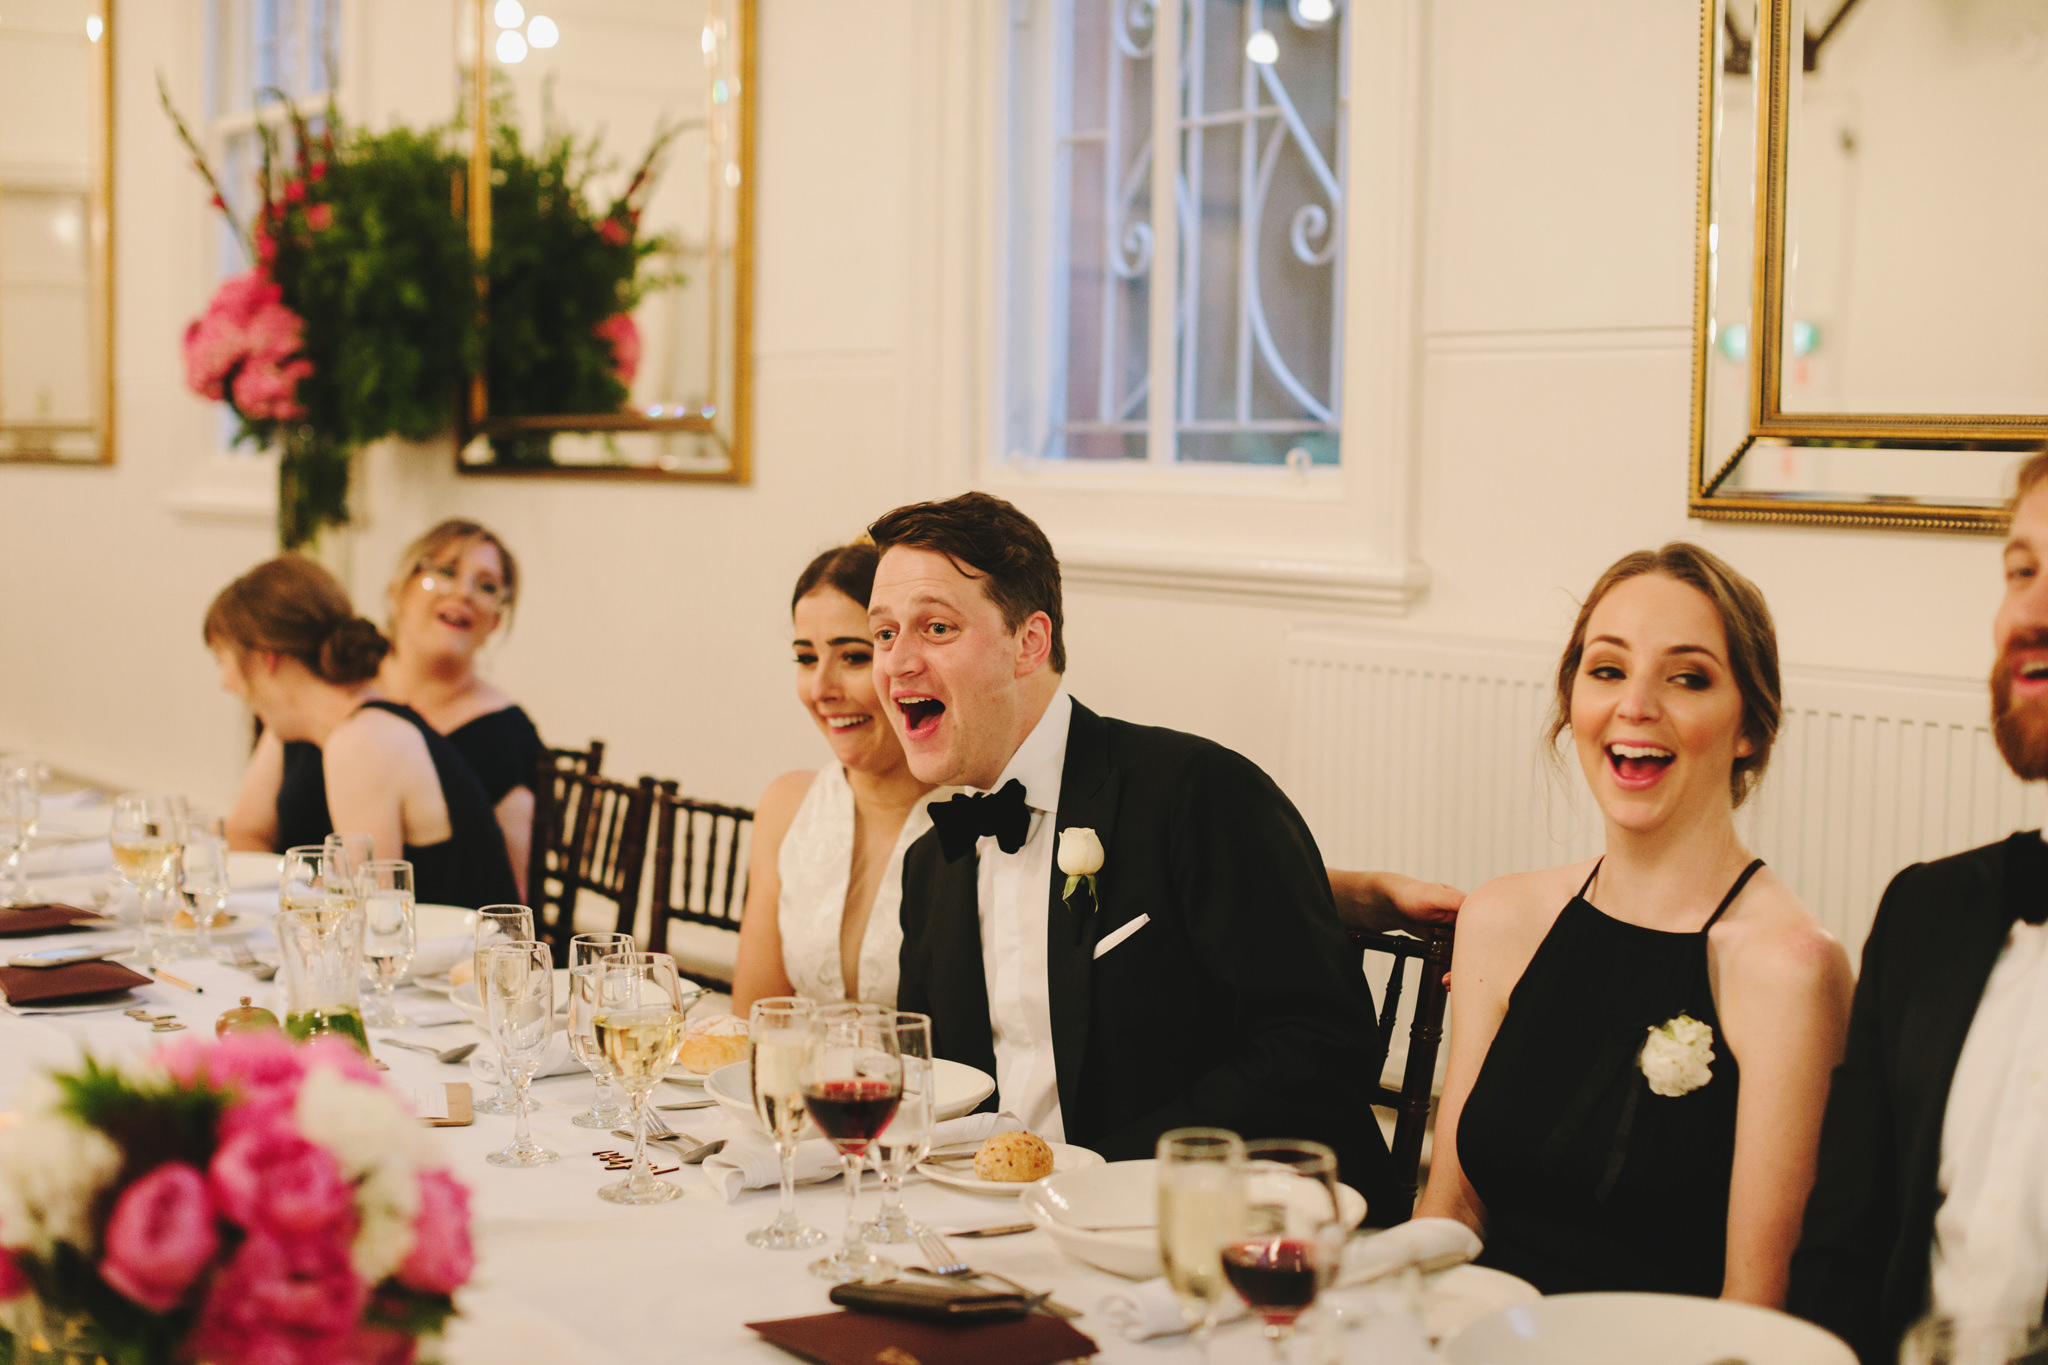 Abbotsford_Convent_Wedding_Peter_Anna105.JPG